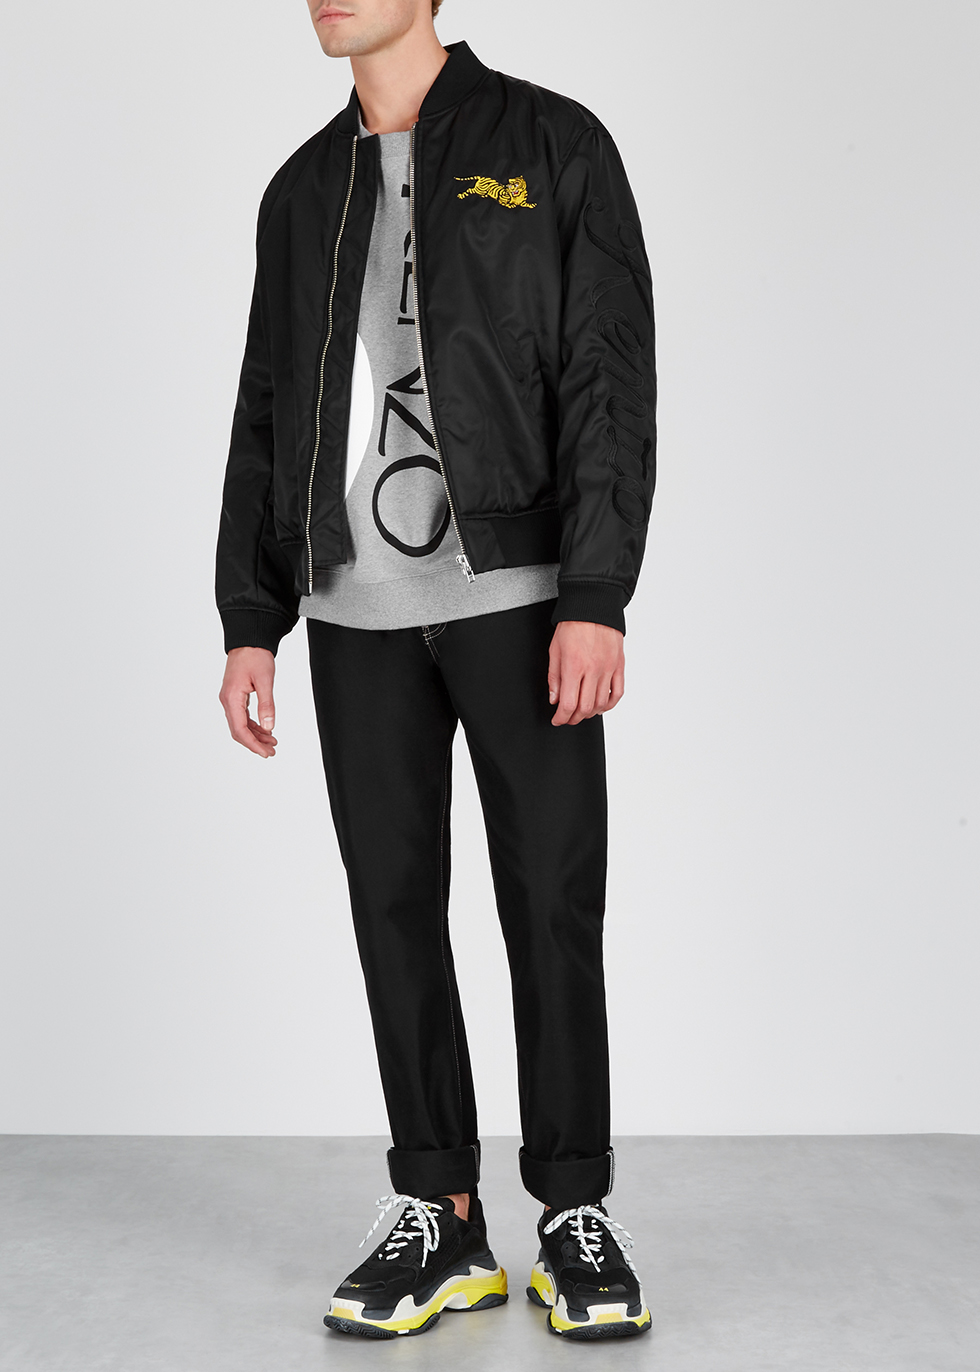 Black embroidered shell bomber jacket - Kenzo